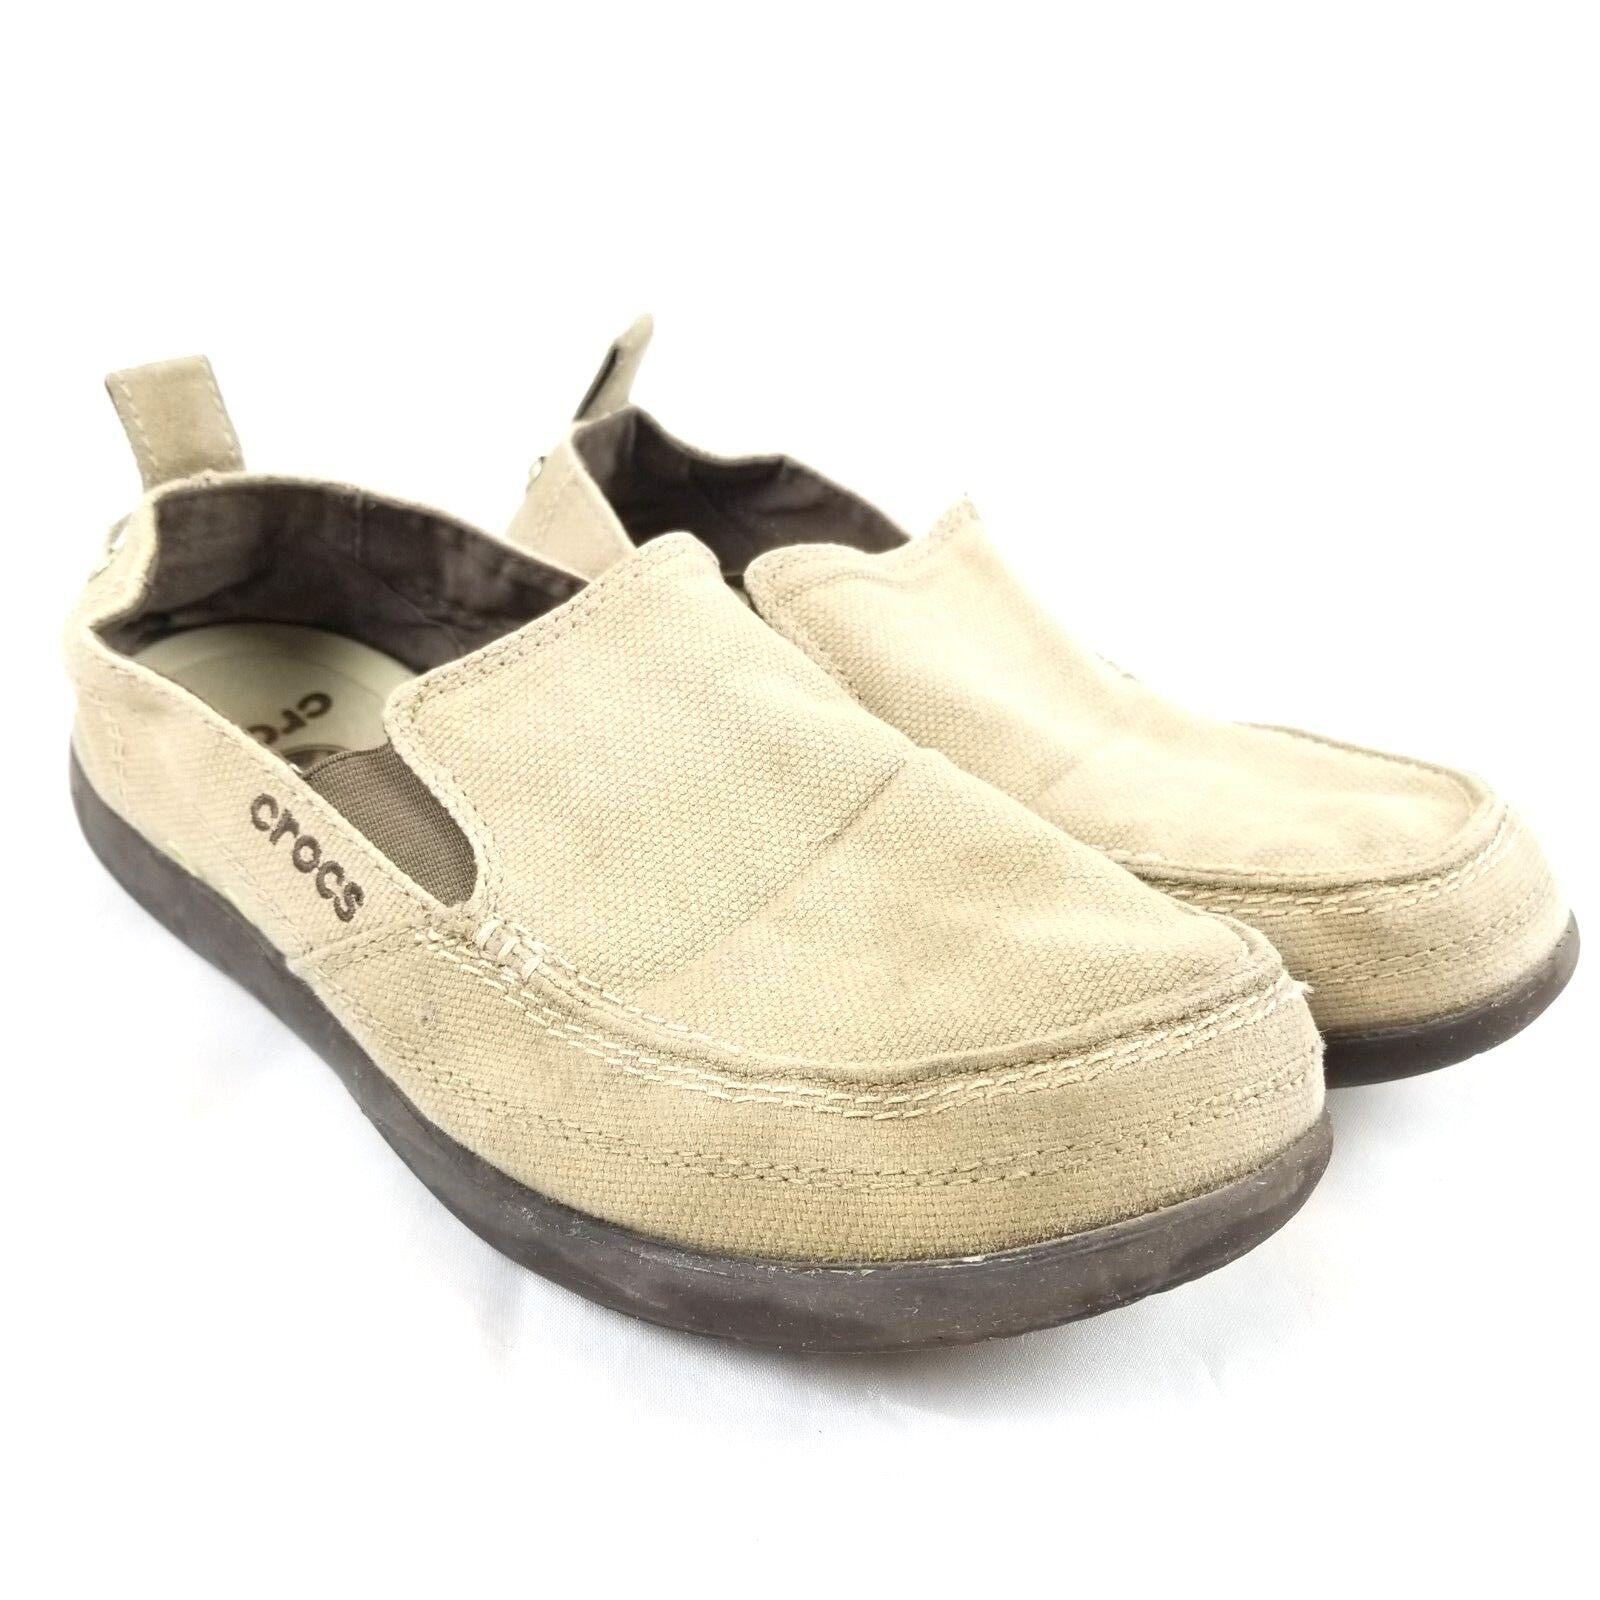 CROCS Walu 11270 Men's Size 9M Khaki Espresso Canvas Loafer Slip Ons